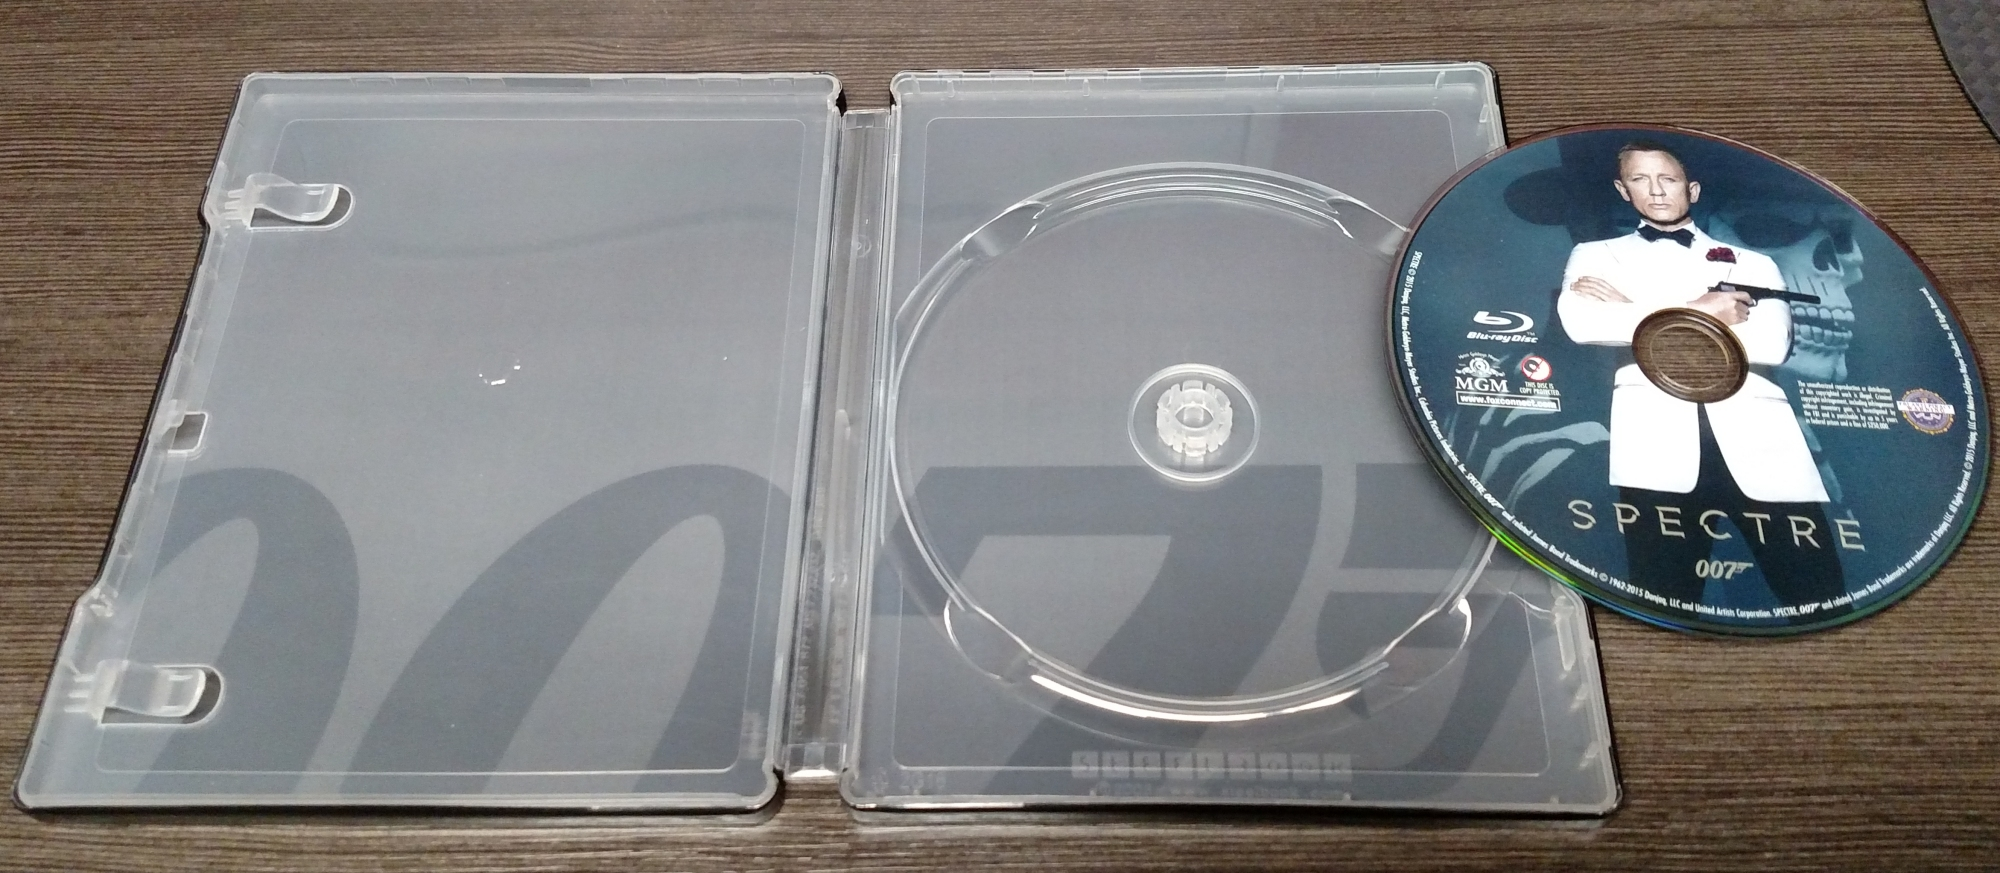 Spectre Blu-ray SteelBook interior